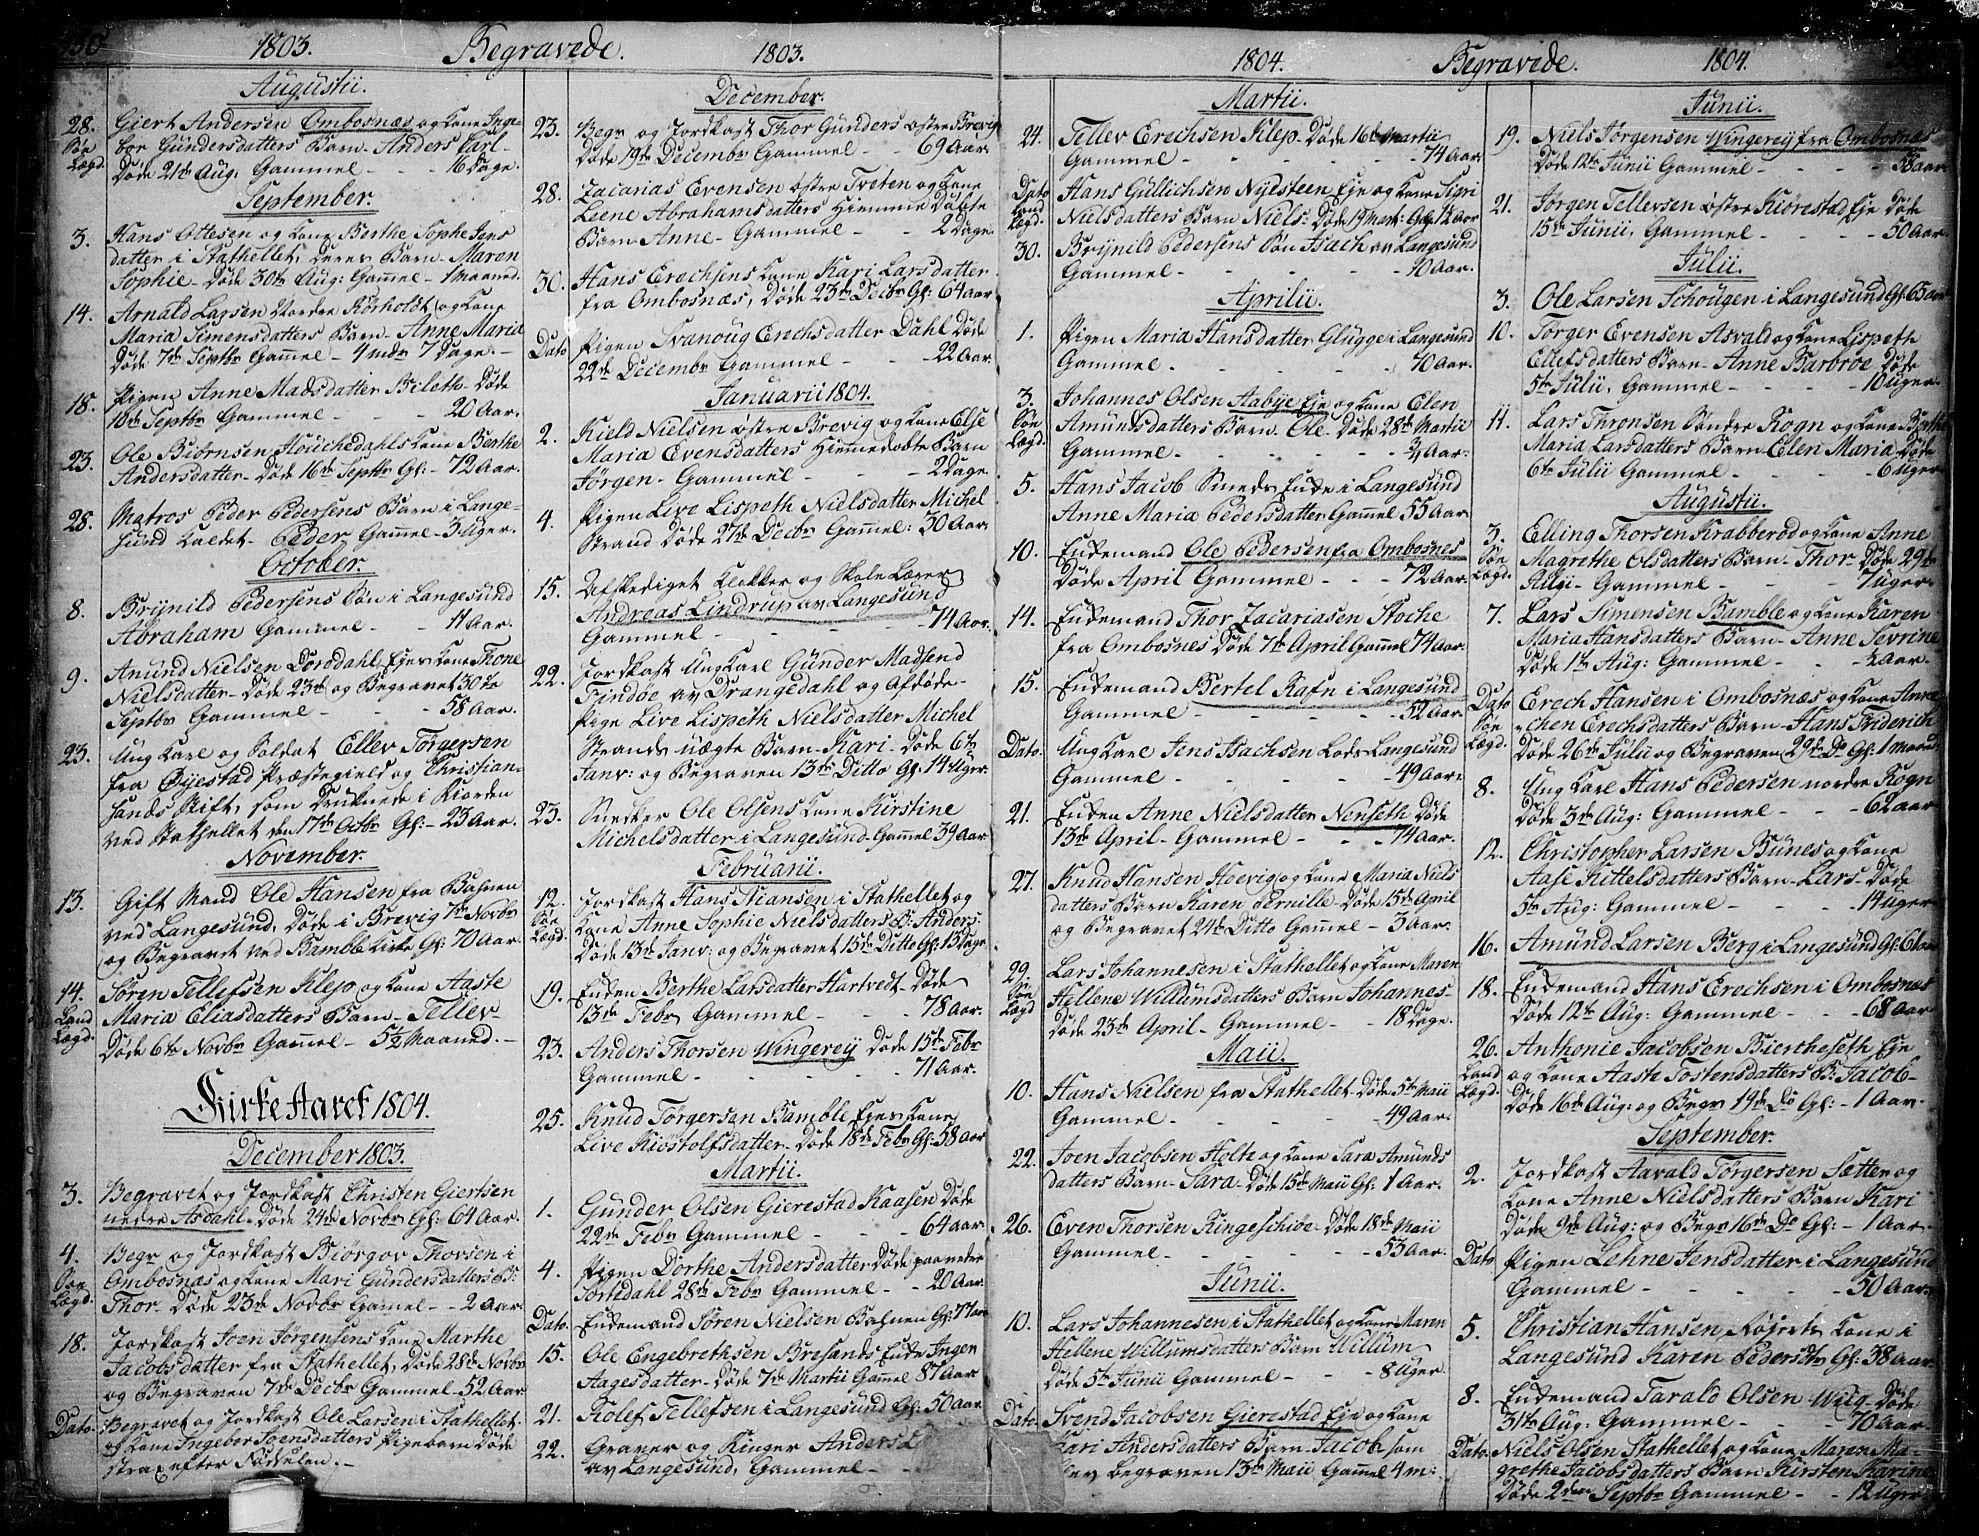 SAKO, Bamble kirkebøker, F/Fa/L0002: Ministerialbok nr. I 2, 1775-1814, s. 550-551